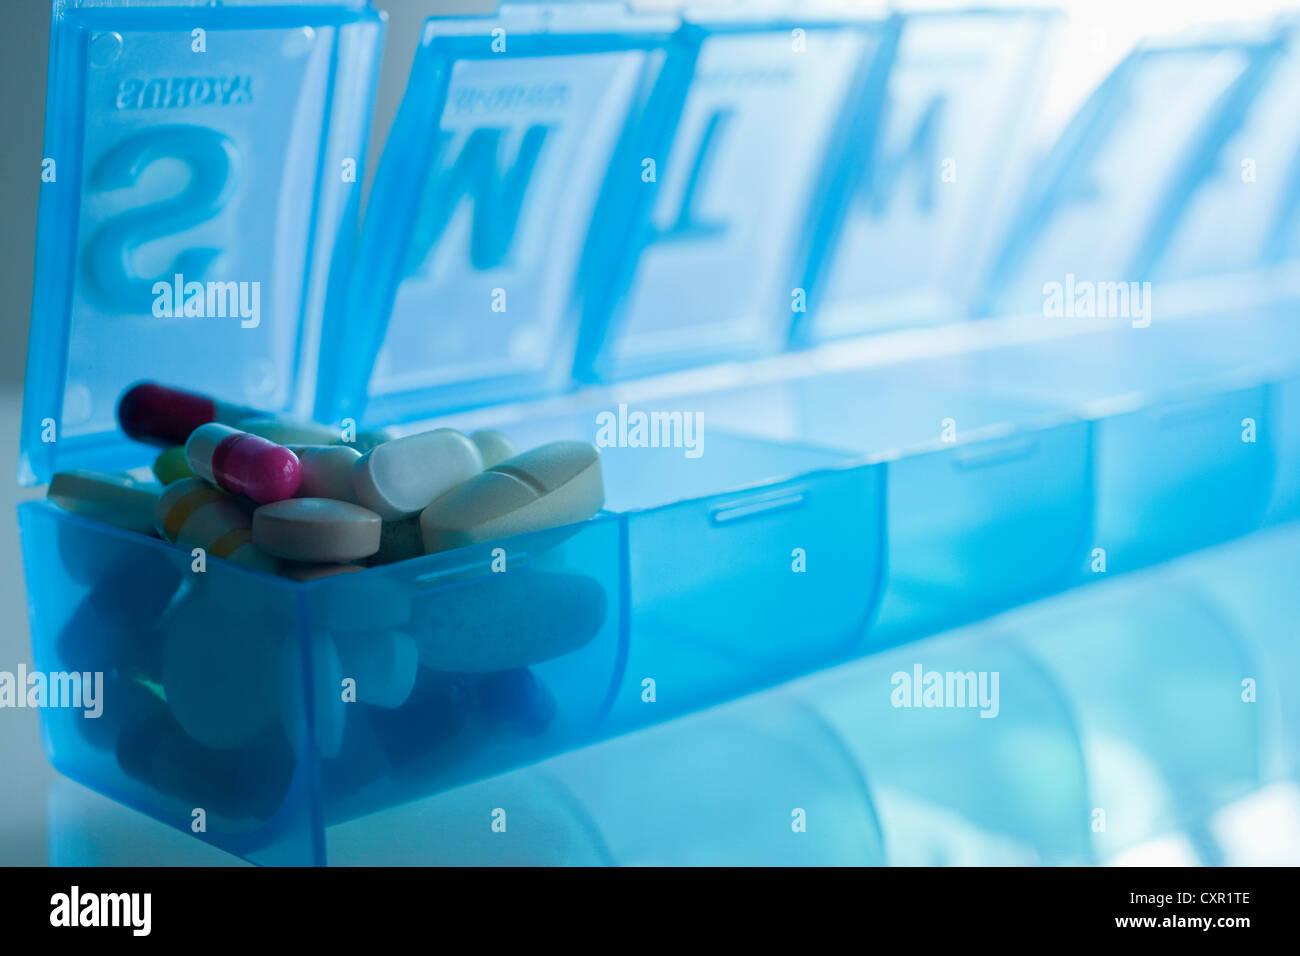 Pills in pillbox - Stock Image